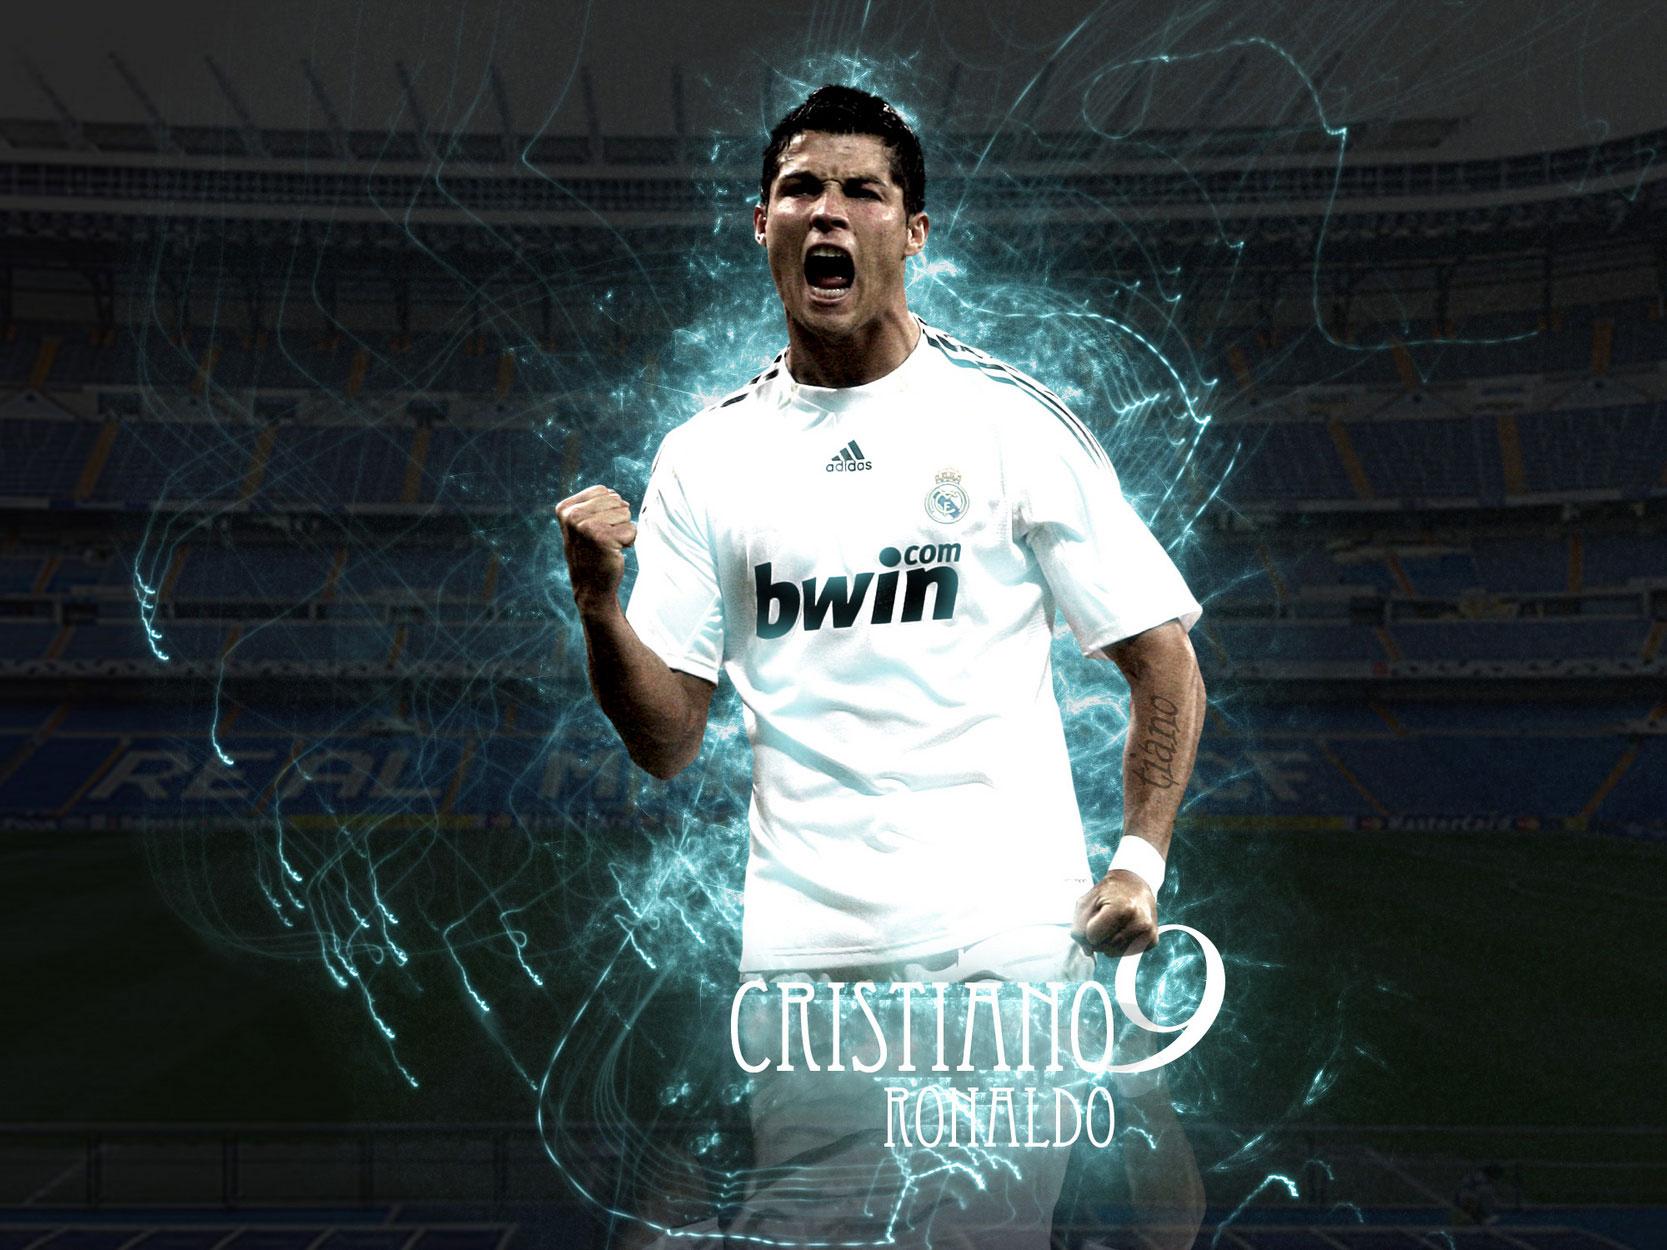 Cristiano Ronaldo 1080p Wallpapers